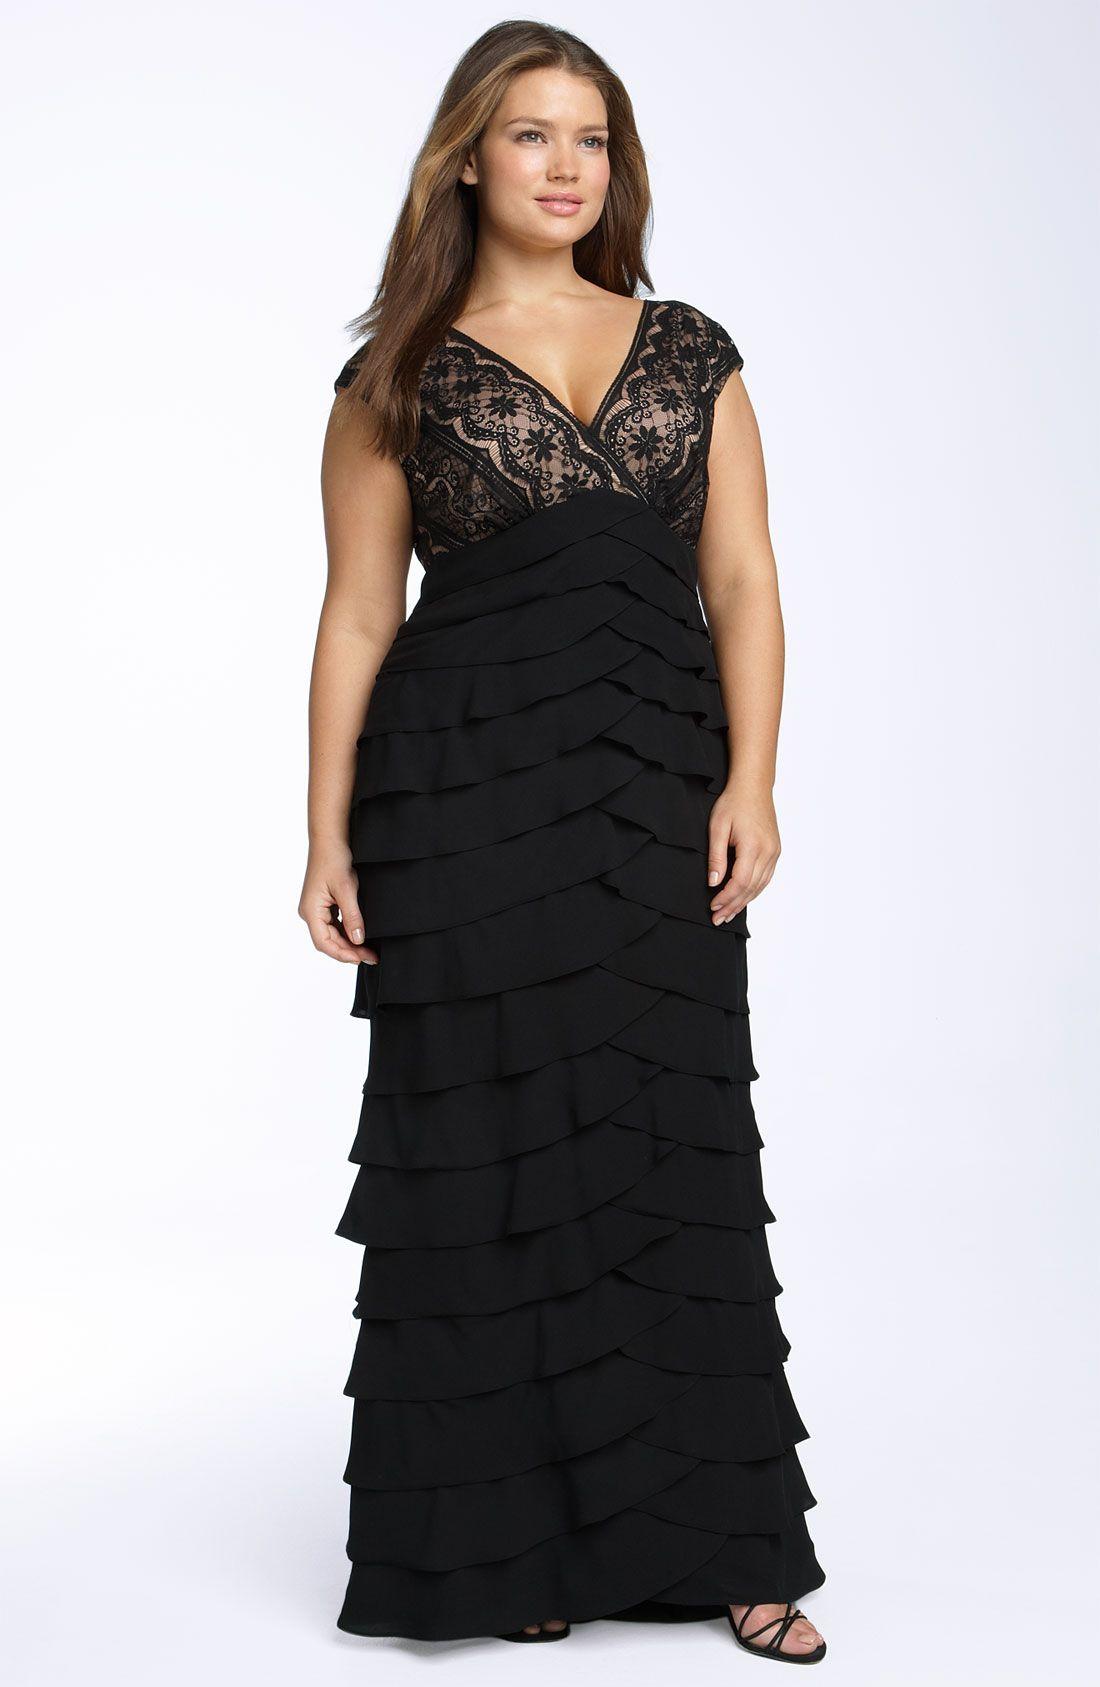 Adrianna Papell Lace Shutter Pleat Gown Plus Size Nordstrom Plus Size Outfits Fashion Plus Size Dresses [ 1687 x 1100 Pixel ]